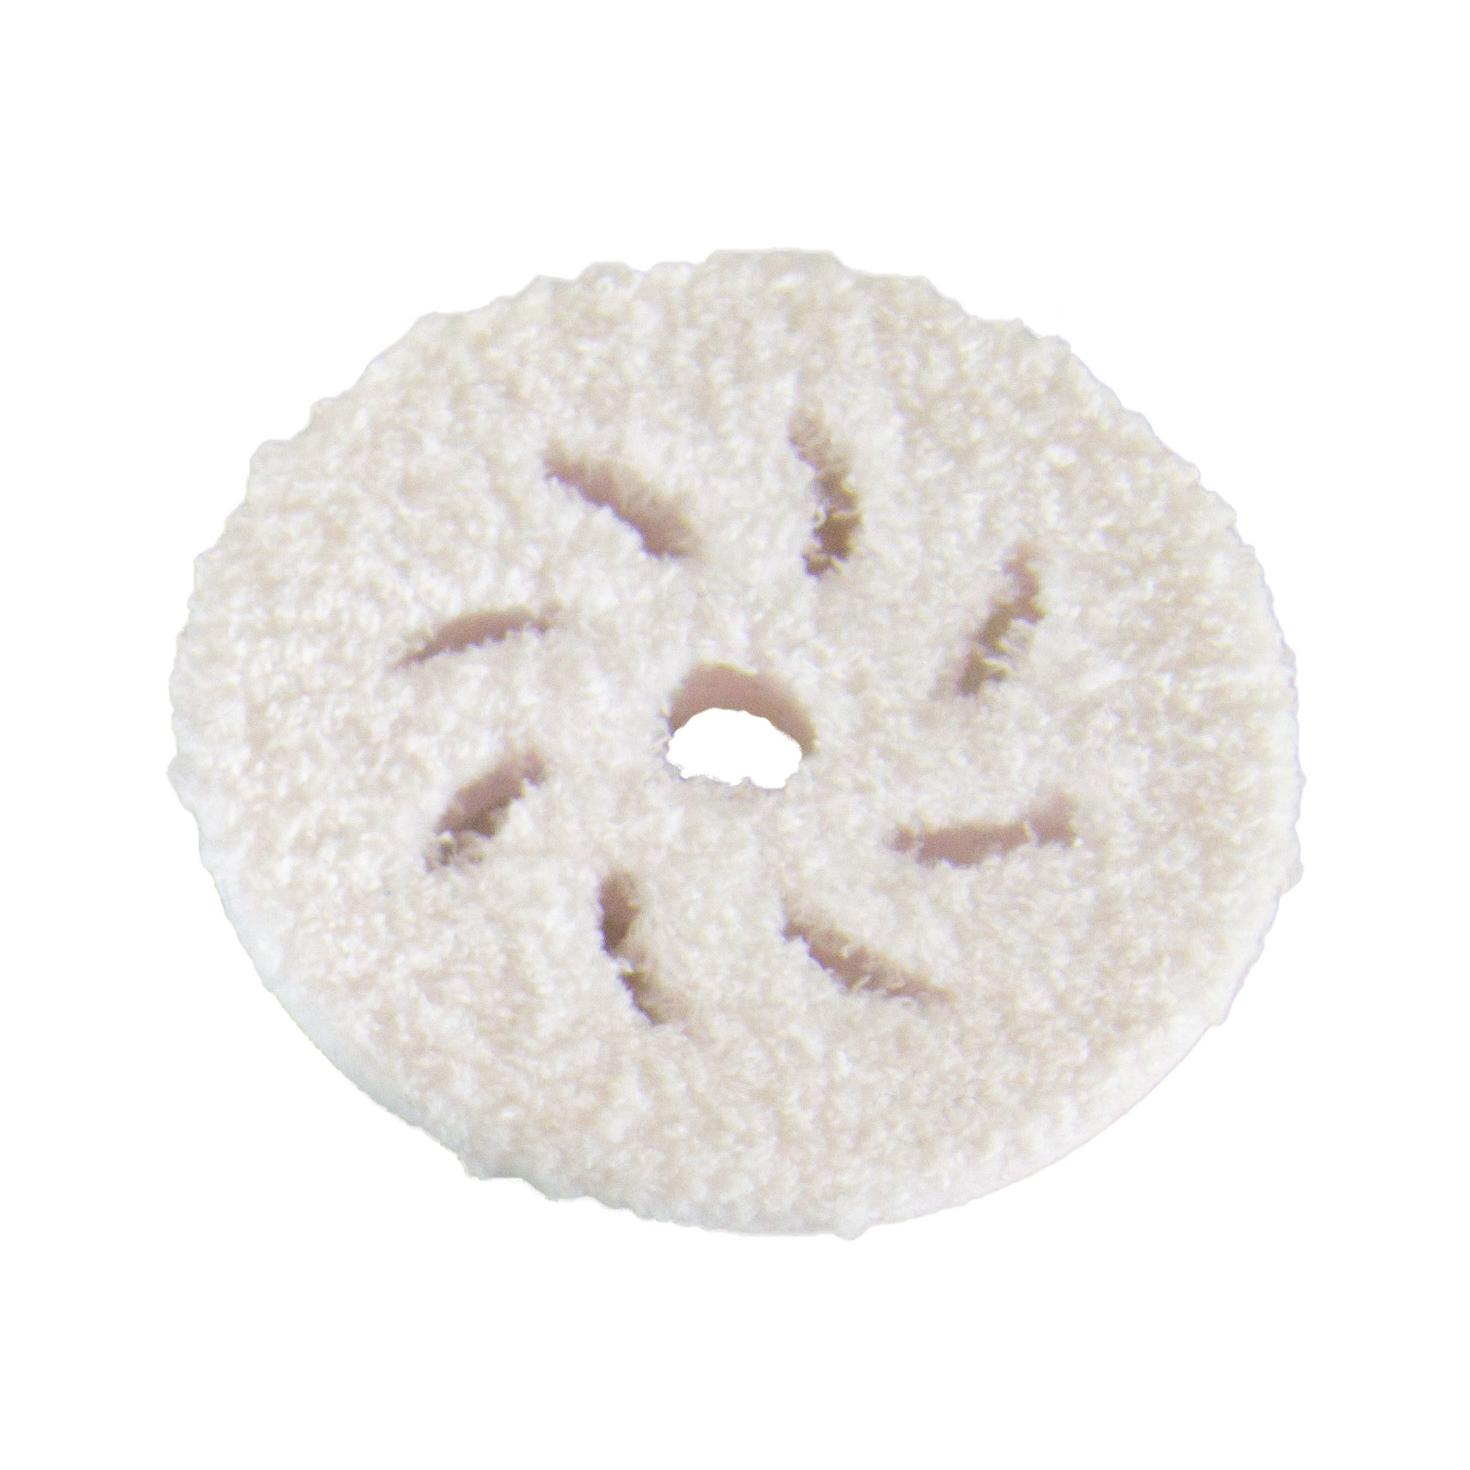 RUPES Medium Wool Polishing Pad Polierpad Polierschwamm gelb 130-145mm 1 Stk